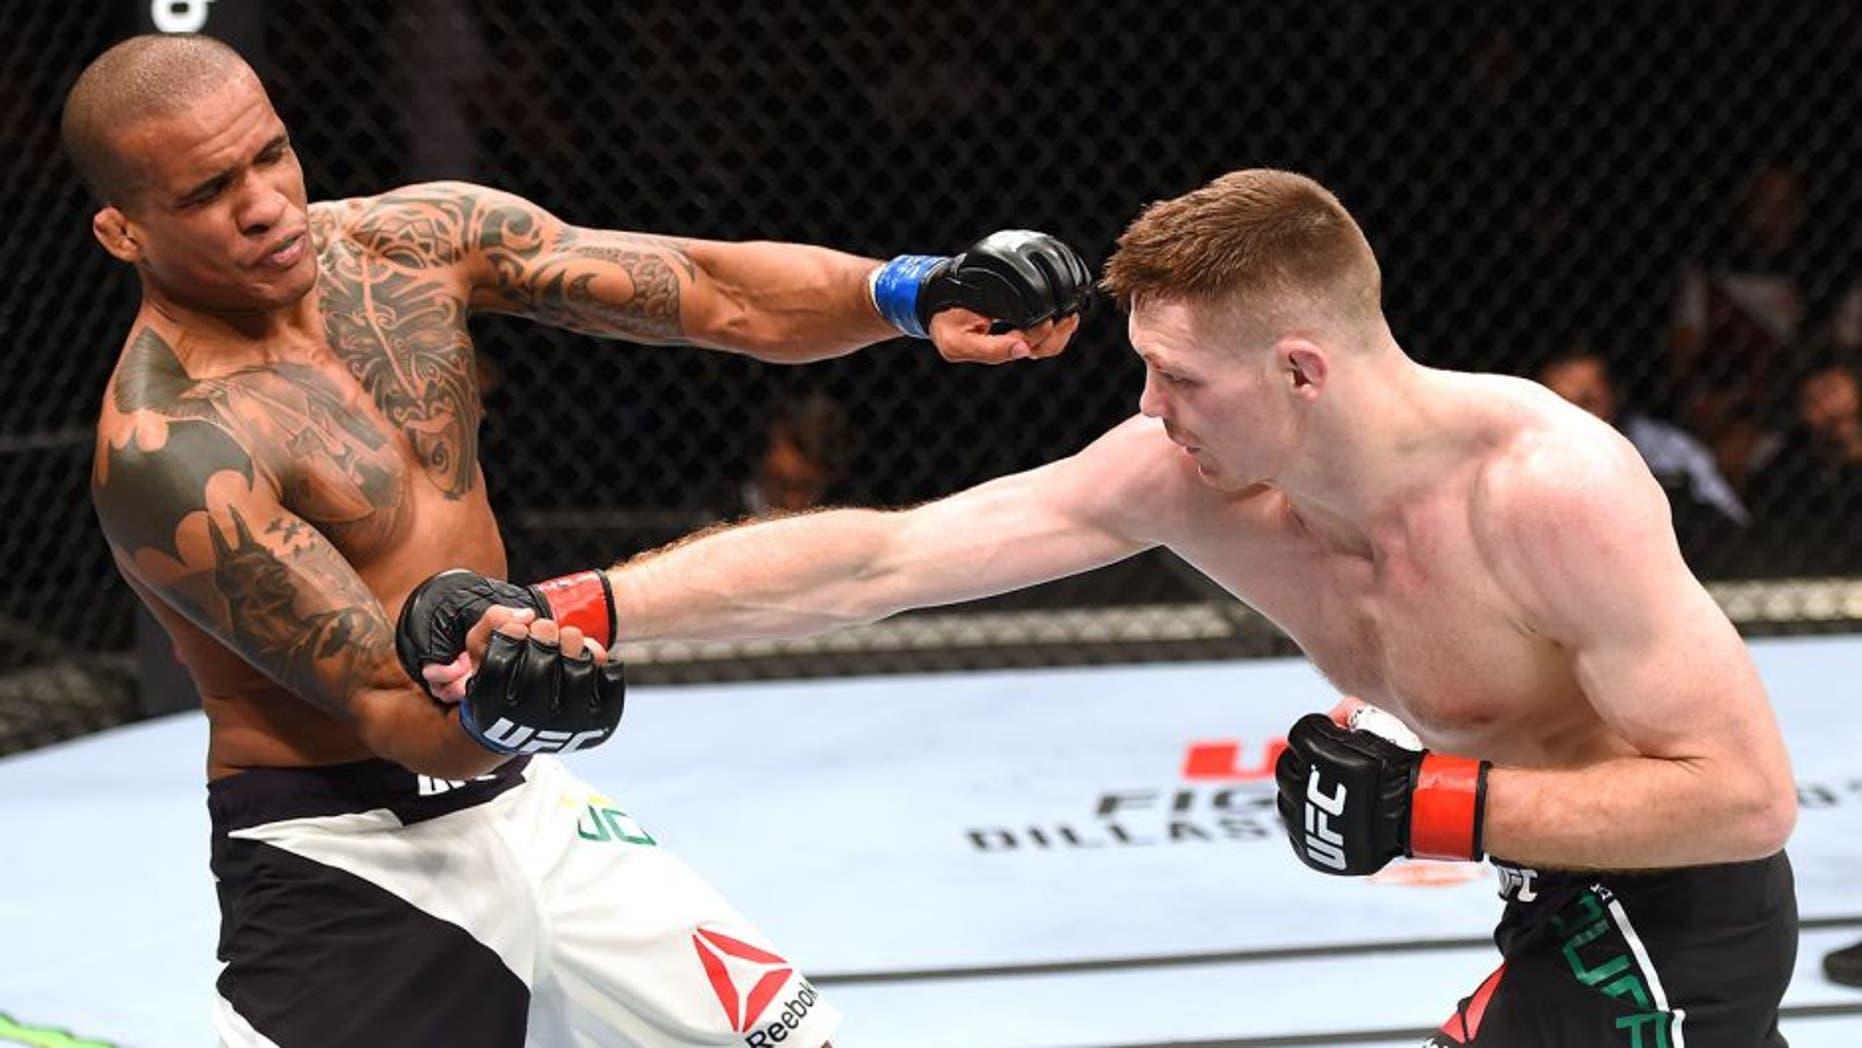 GLASGOW, SCOTLAND - JULY 18: (R-L) Joe Duffy of Ireland punches Ivan Jorge of Brazil in their lightweight fight during the UFC Fight Night event inside the SSE Hydro on July 18, 2015 in Glasgow, Scotland. (Photo by Josh Hedges/Zuffa LLC/Zuffa LLC via Getty Images)